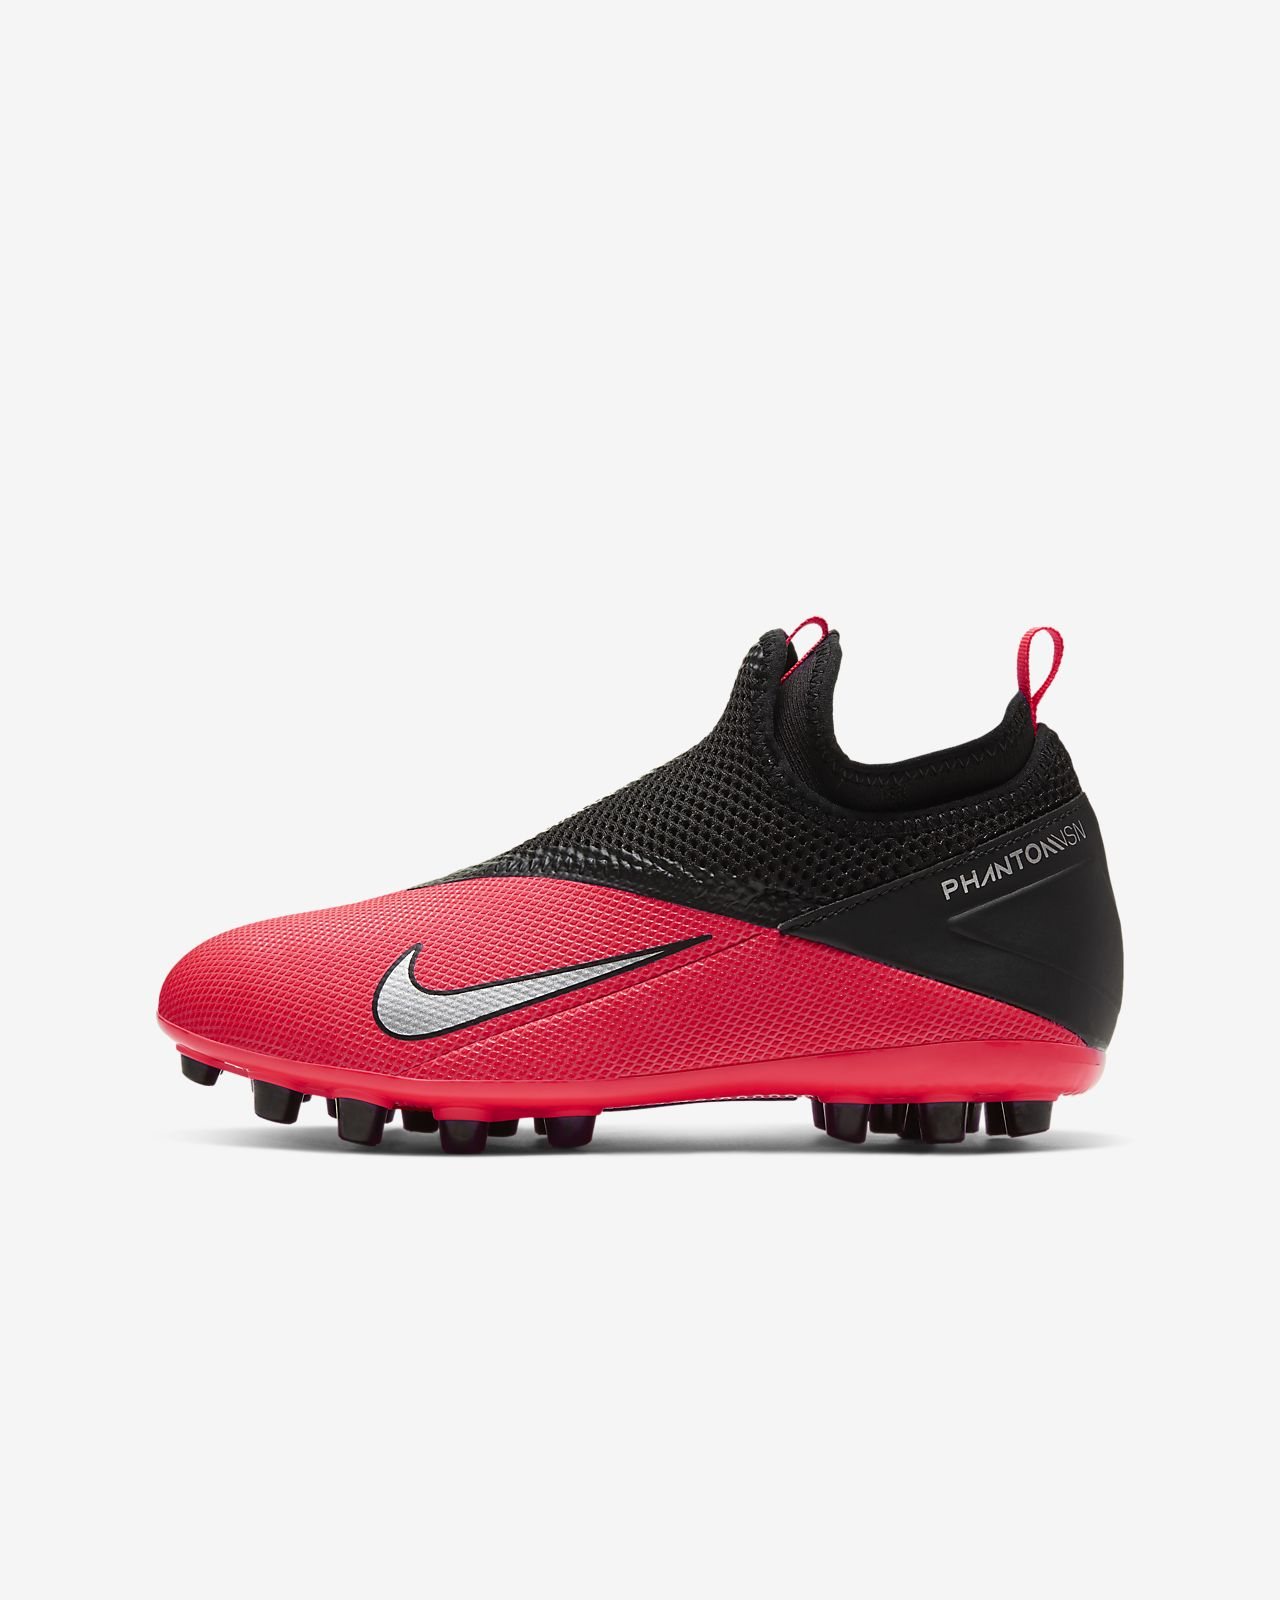 Nike Jr Phantom Vision 2 Academy Dynamic Fit AG Kids' Artificial Grass Football Boot